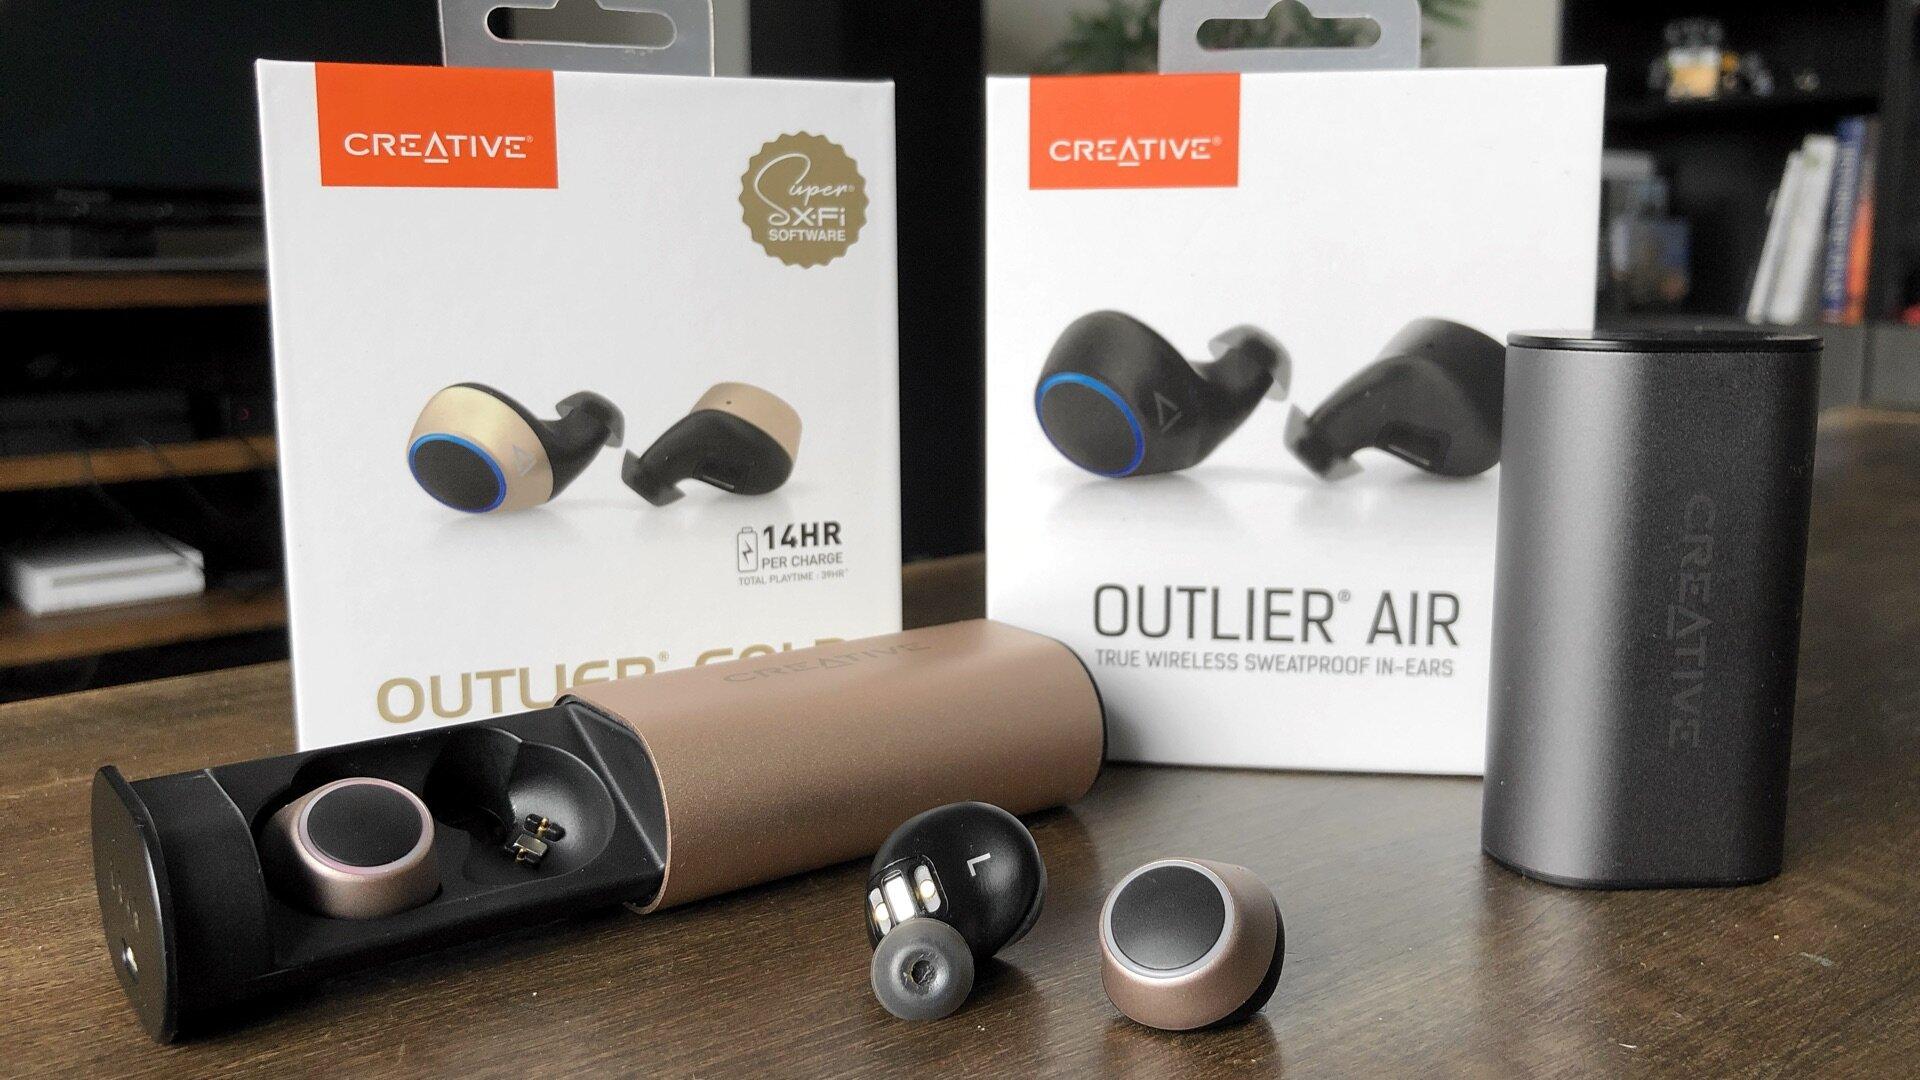 Creative Outlier Air Gold review comparison versus.jpg